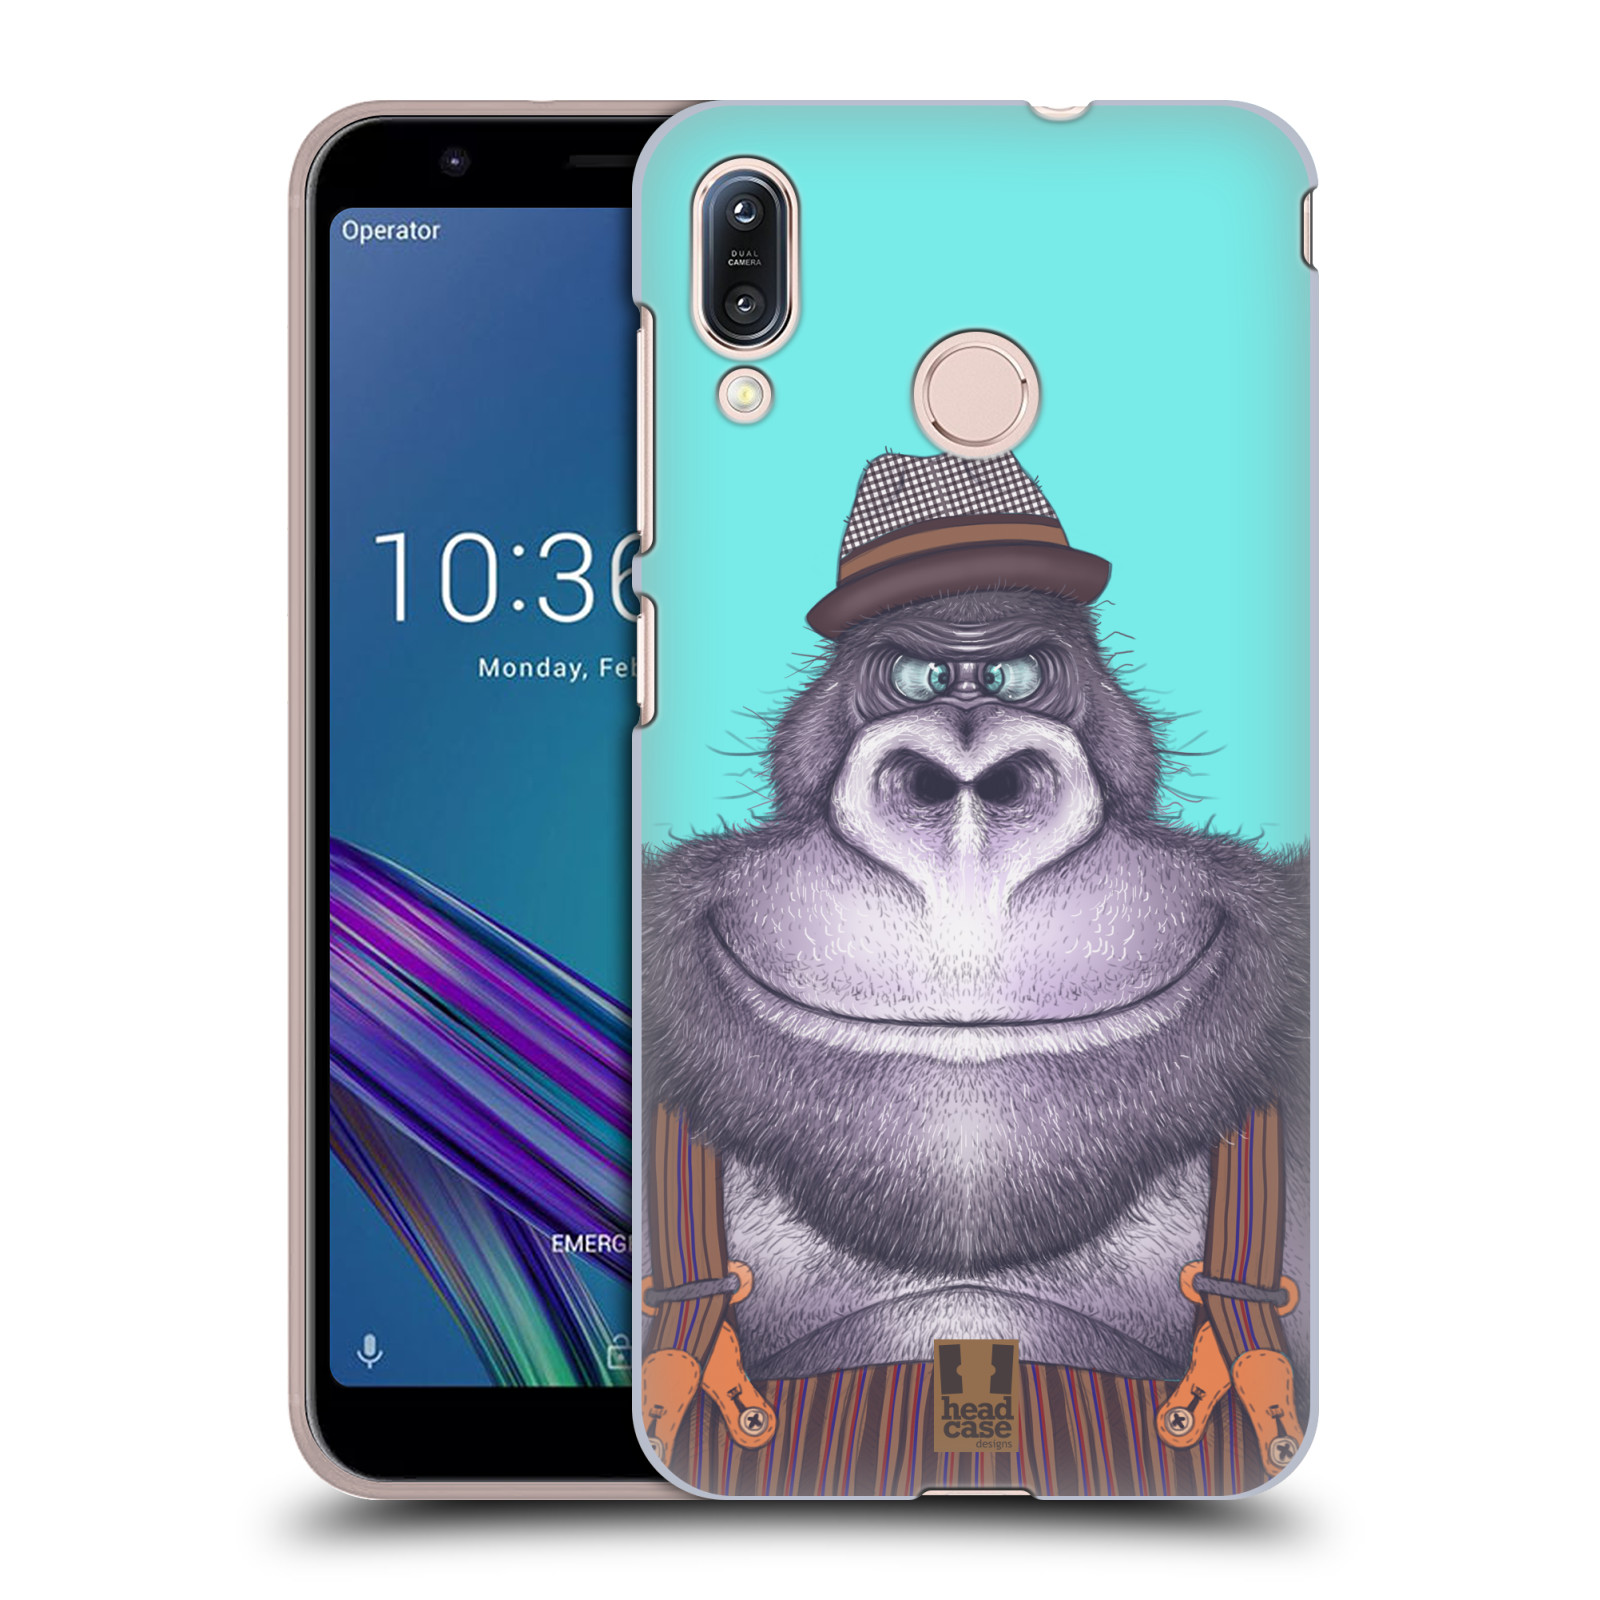 Pouzdro na mobil Asus Zenfone Max M1 (ZB555KL) - HEAD CASE - vzor Kreslená zvířátka gorila